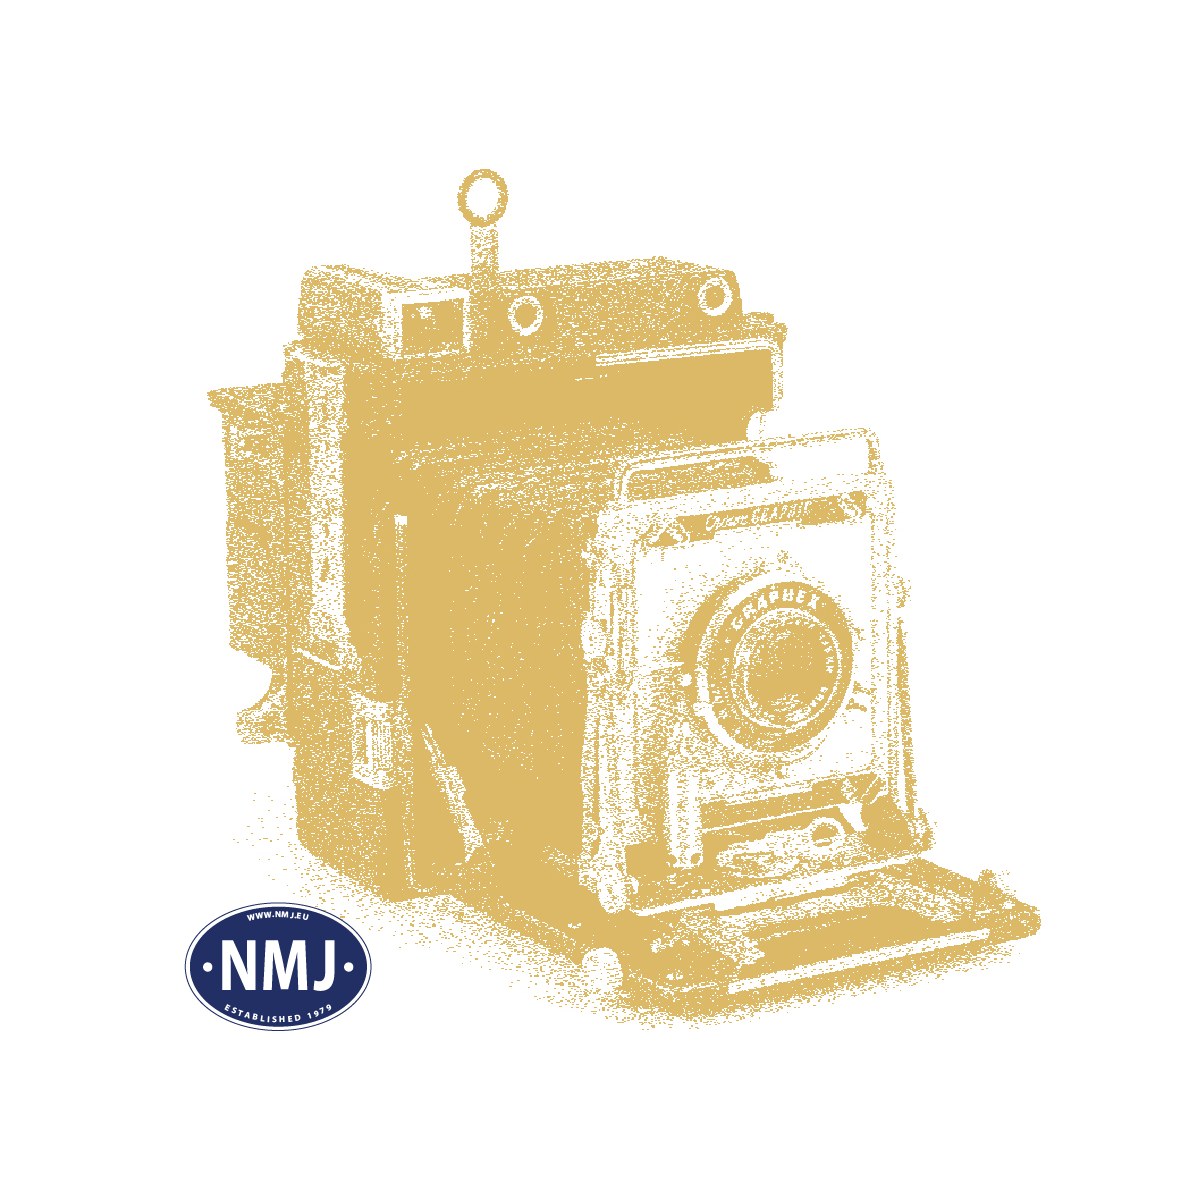 NMJT145001 - NMJ Topline NSB Di3b 641 rot braun, 0-Skala 1:45